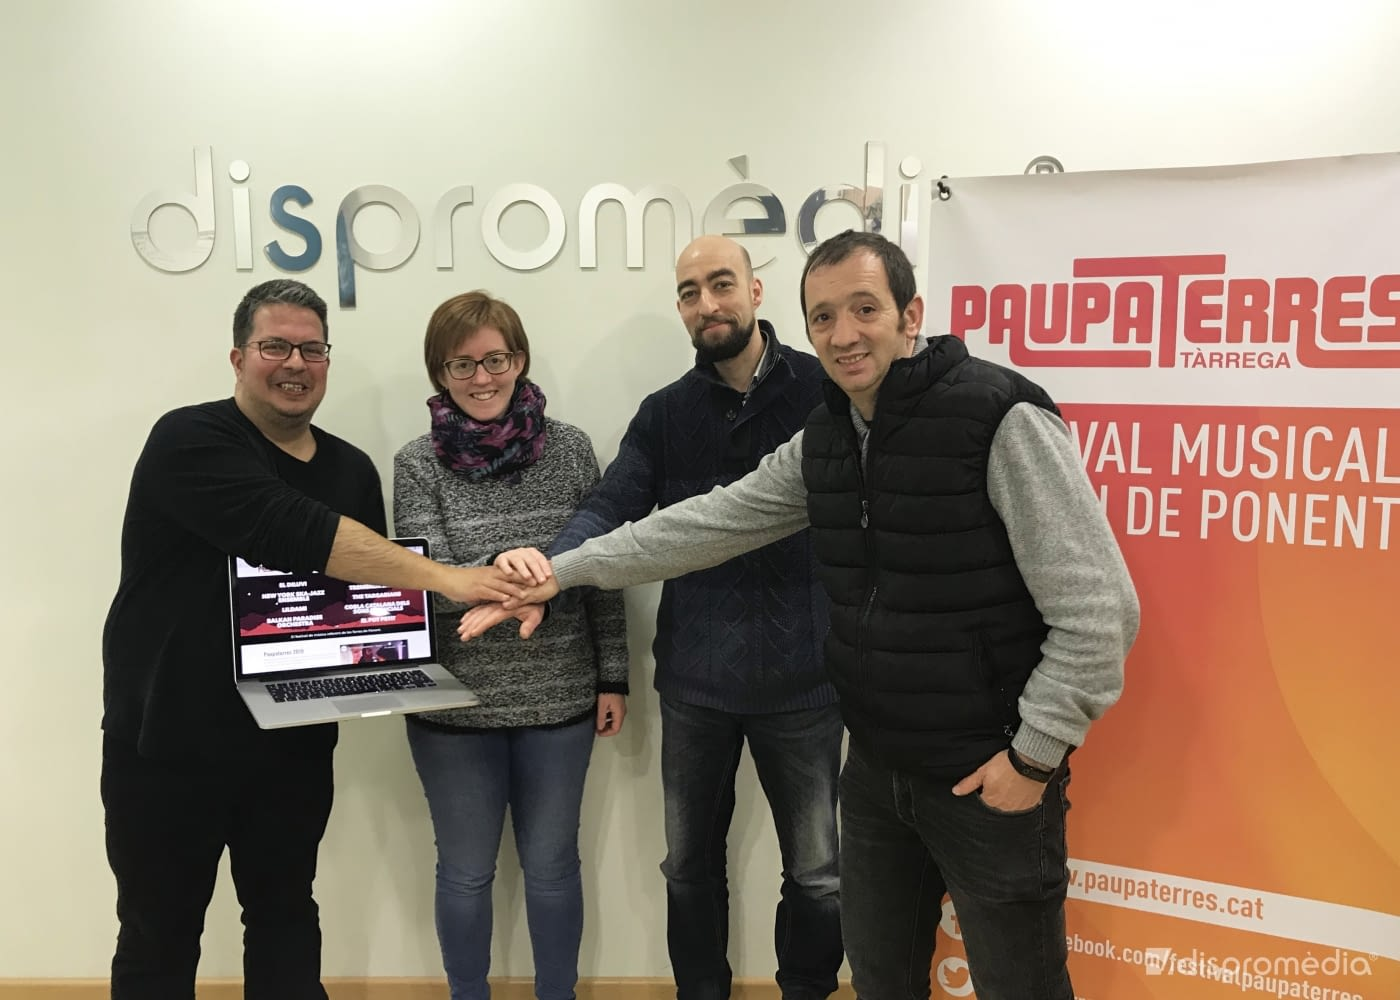 Dispromèdia, socio tecnológico del festival Paupaterres